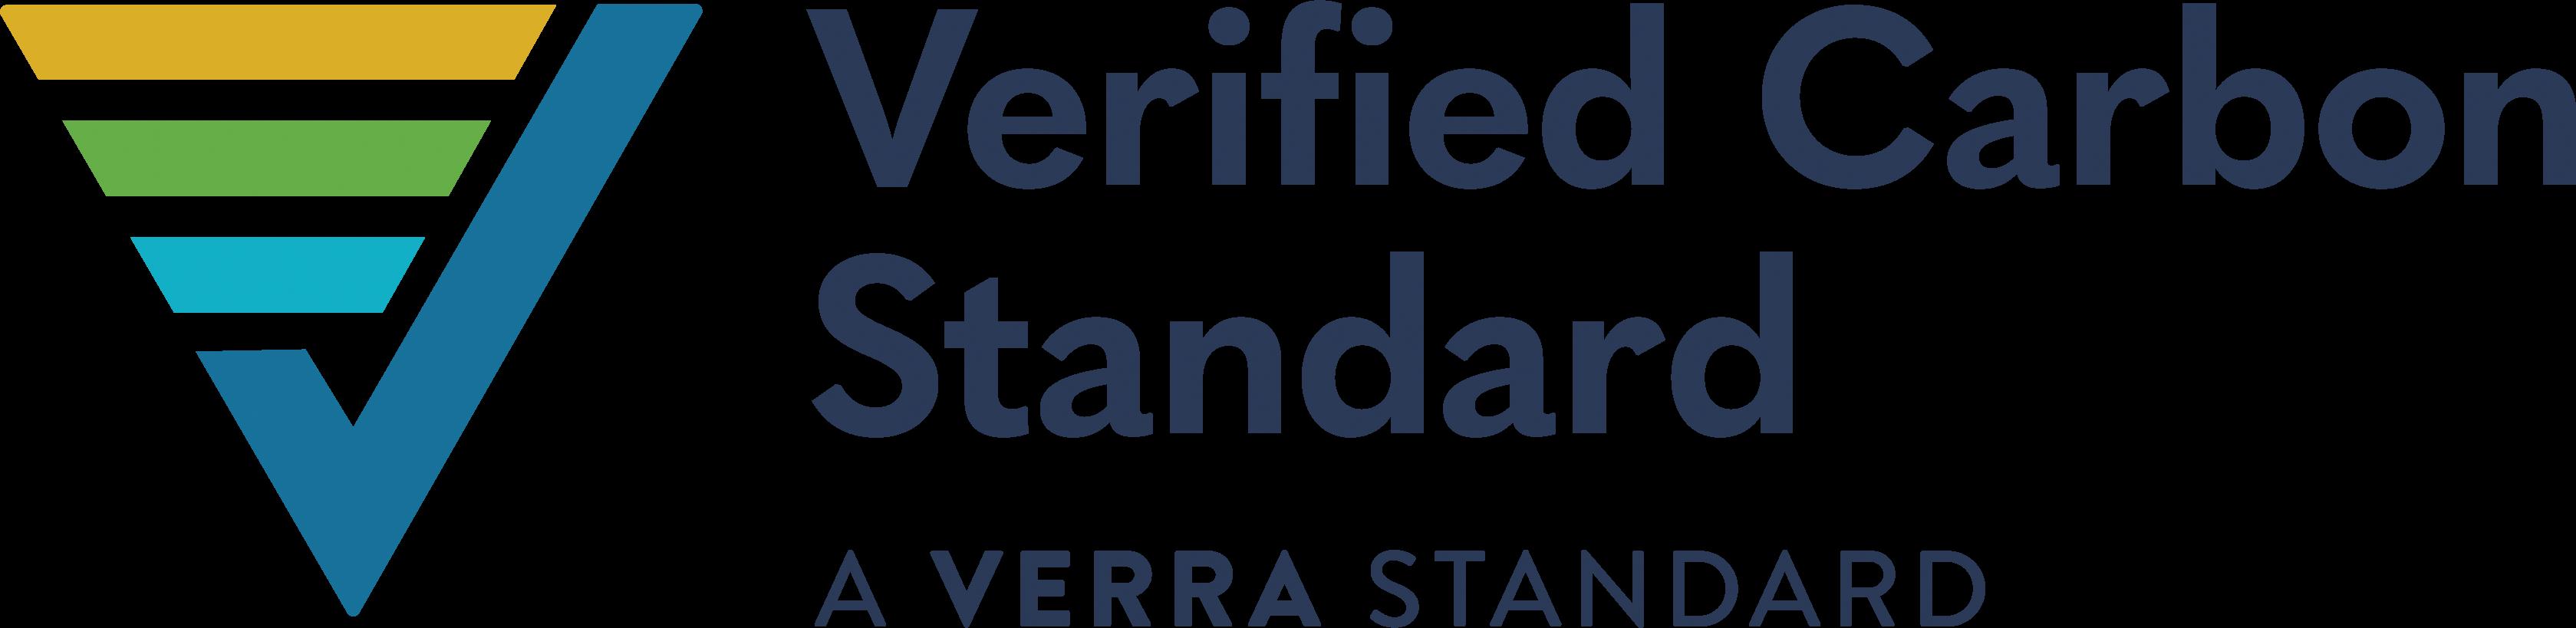 Verified Carbon Standard Logo